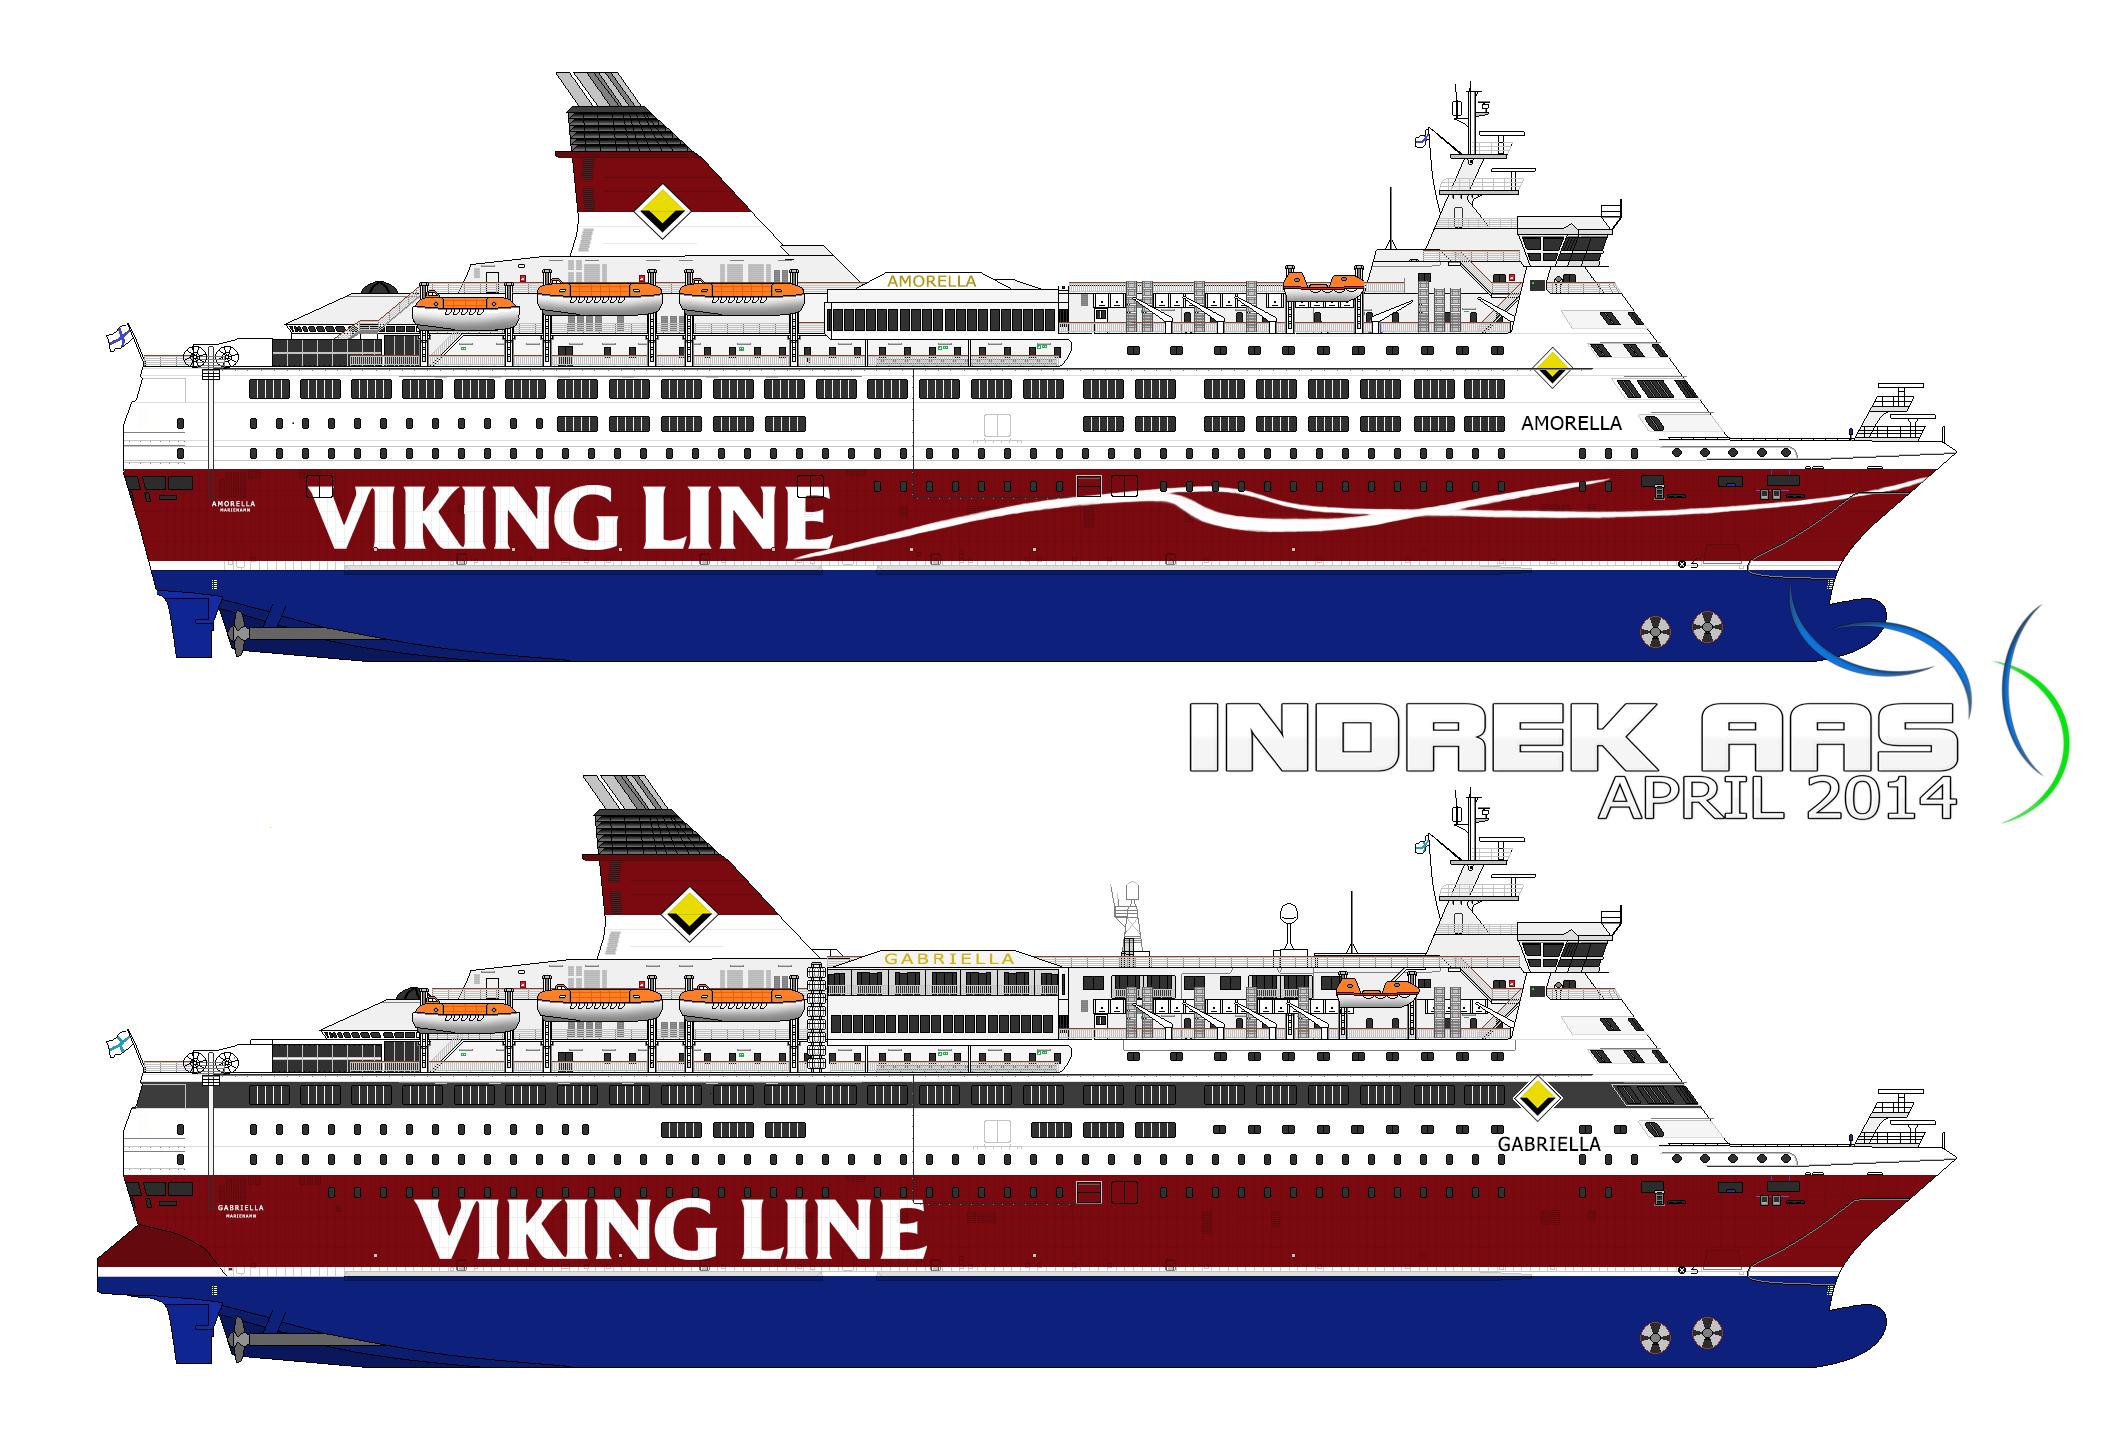 viking line ms amorella